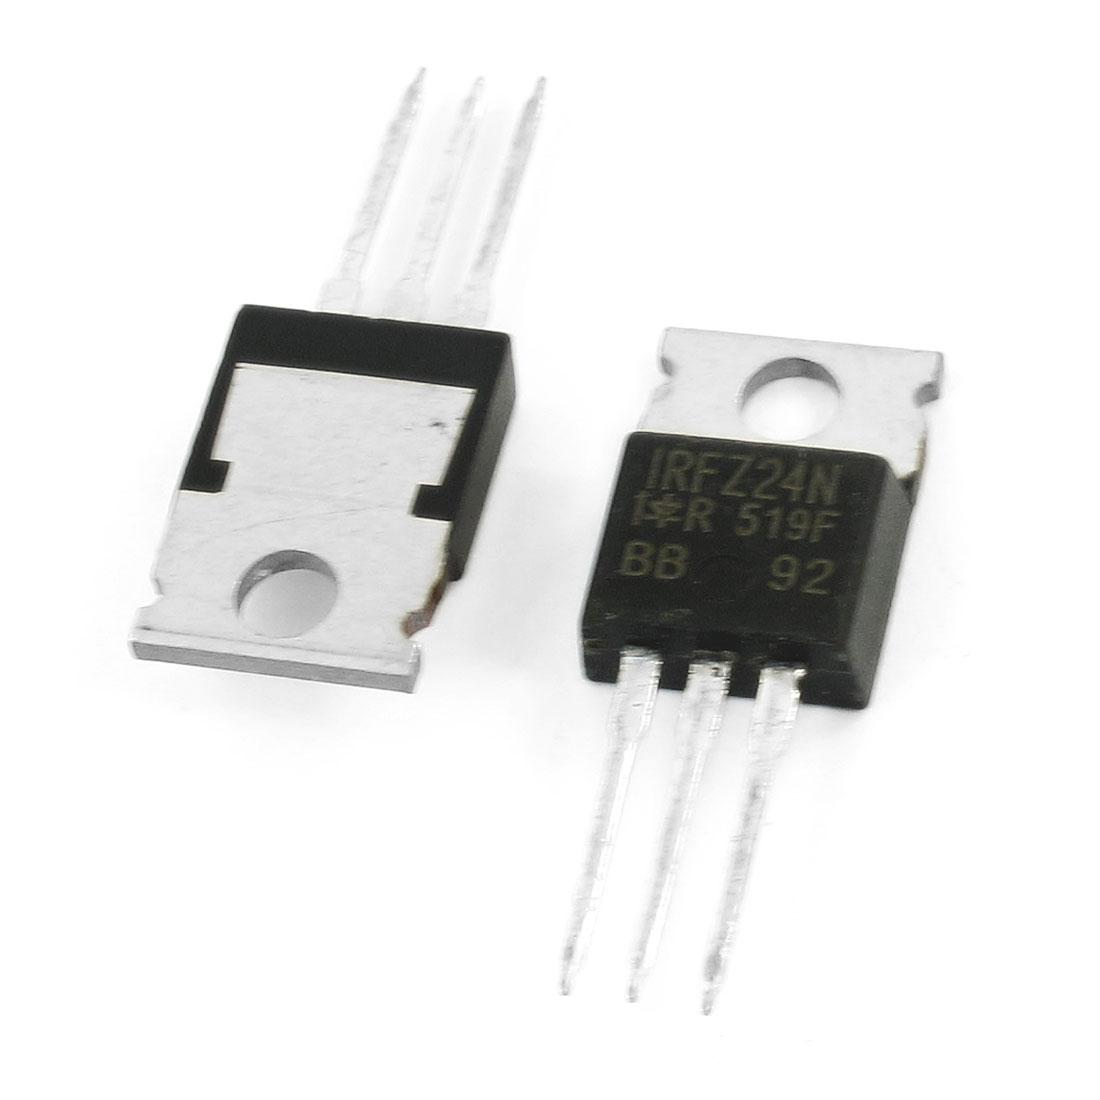 IRFZ24N 55V 17Amp 45W 3 Pole Semiconductor Silicon Transistor 2 Pcs